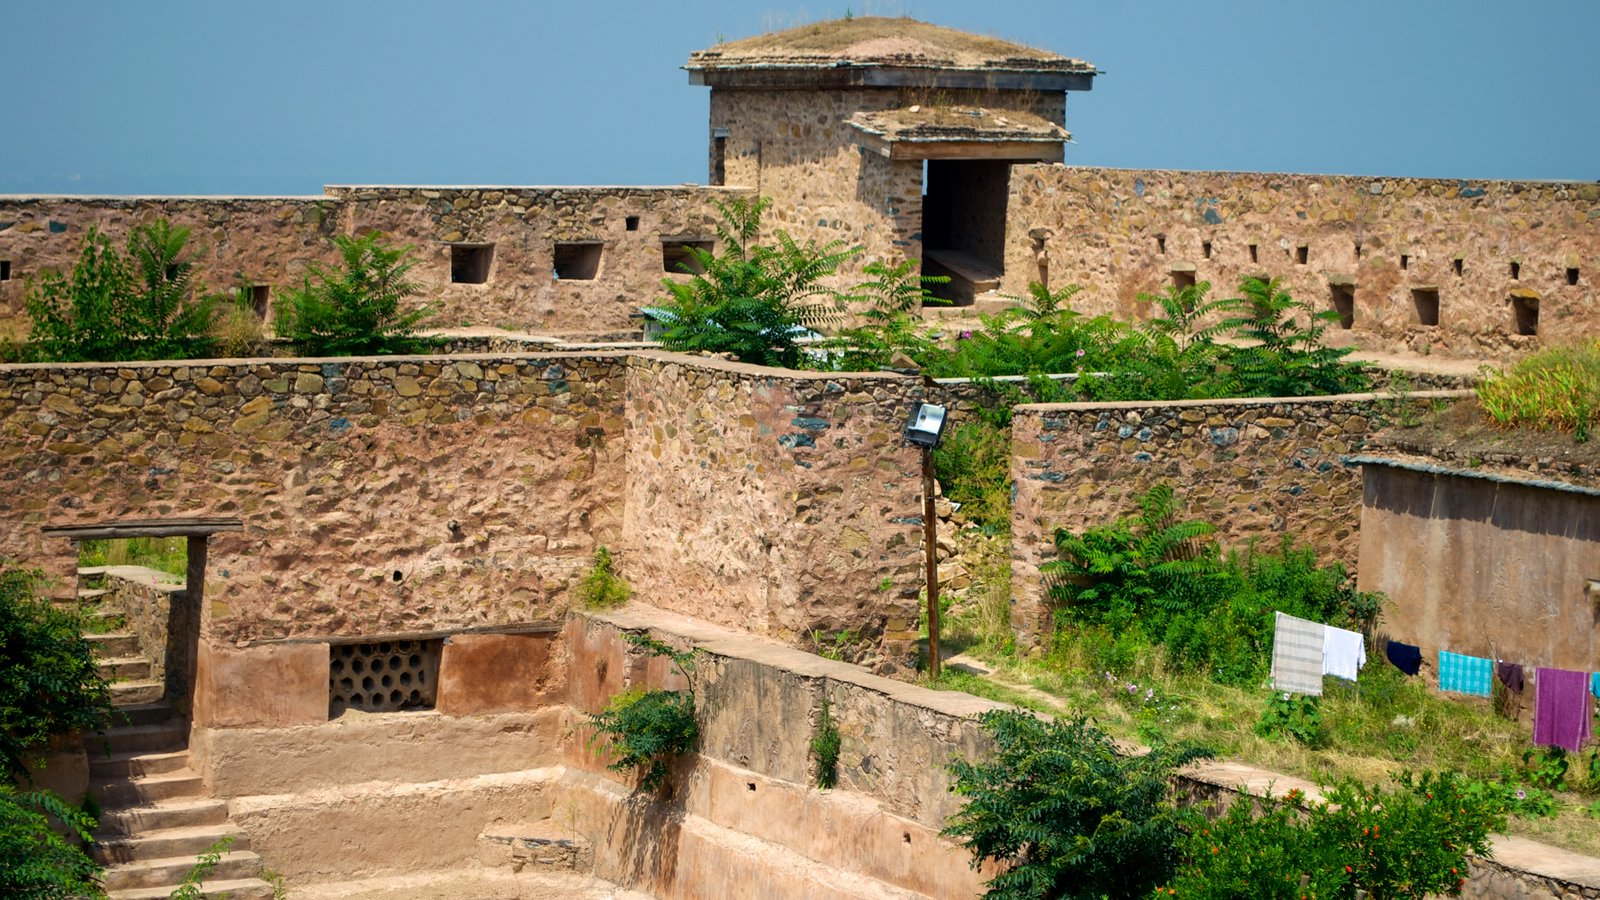 Hari Parbat Fort which includes heritage architecture